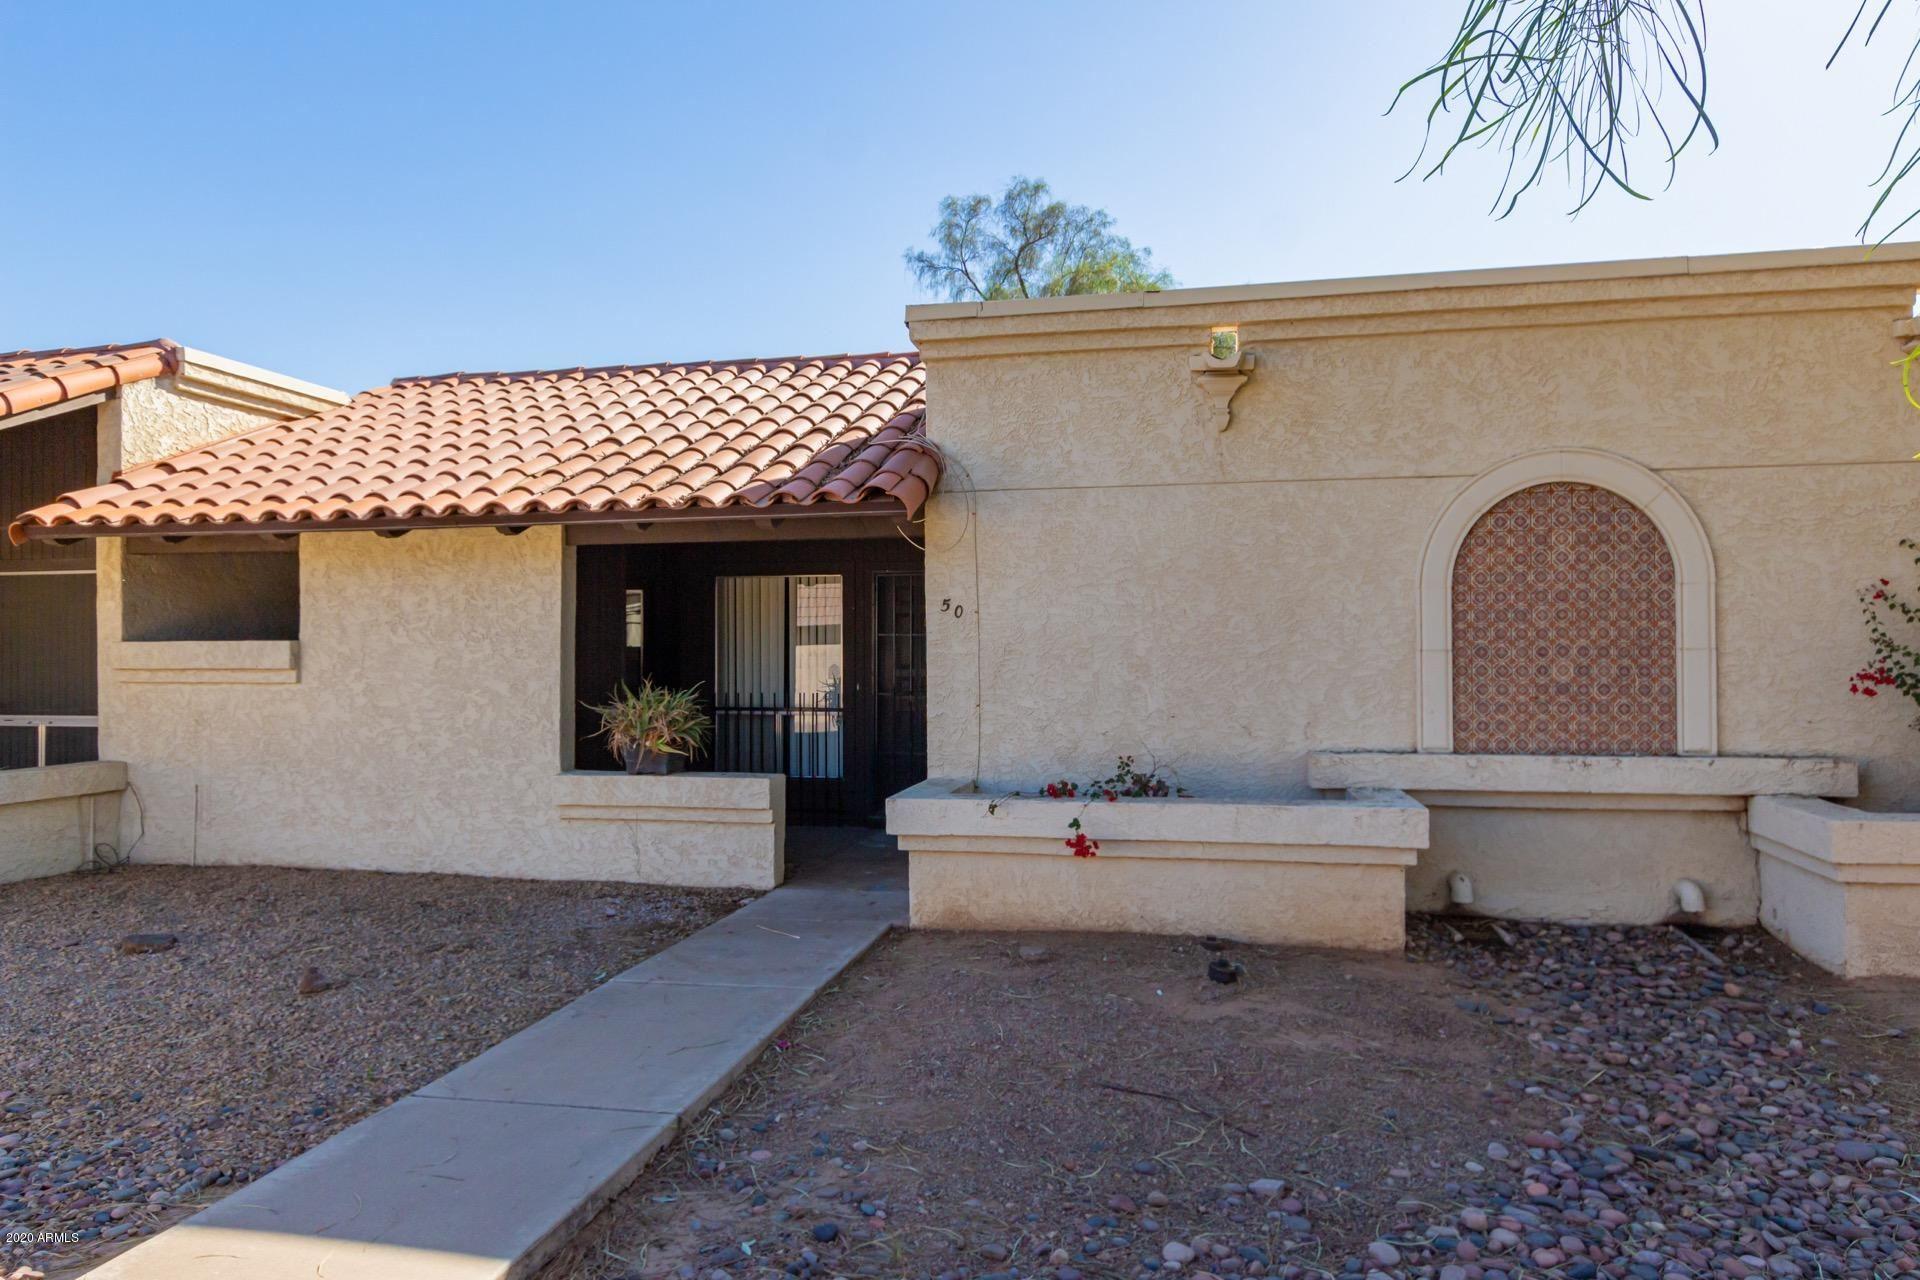 4820 N 89TH Avenue #50, Phoenix, AZ 85037 - MLS#: 6163165